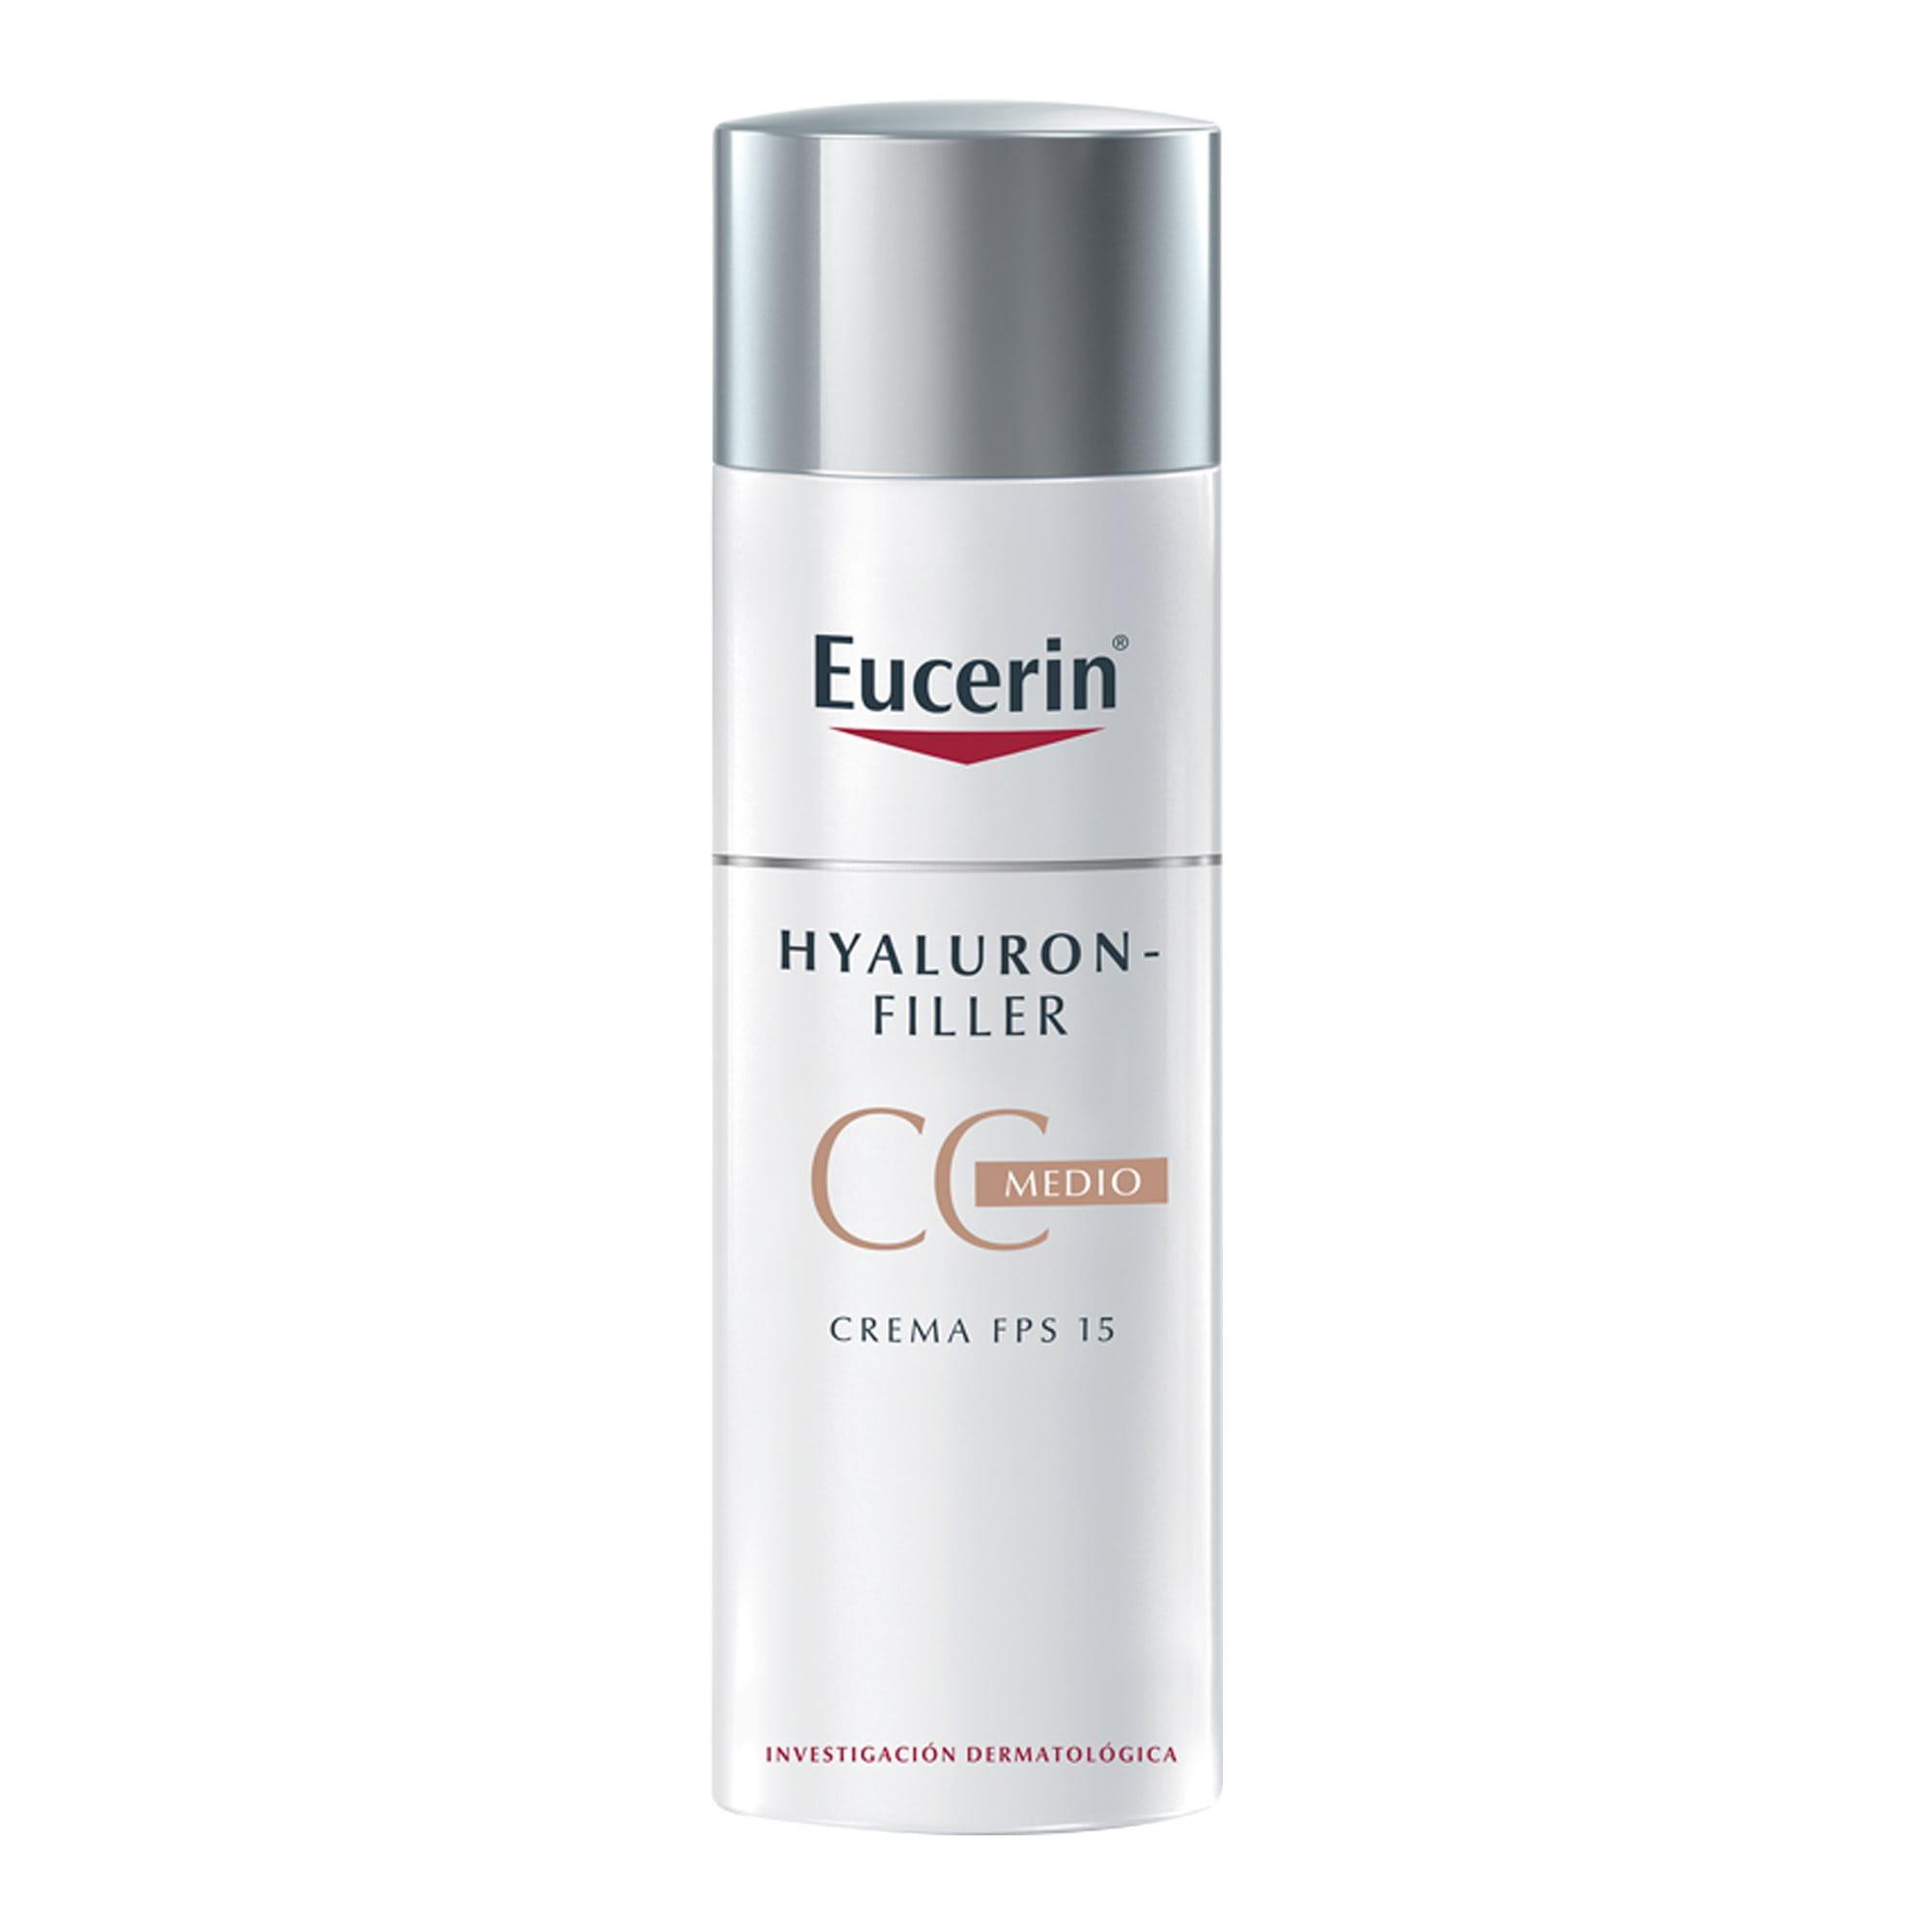 87923_Eucerin-Hyaluron-filler-CC-Cream-Tono-Medio_packshot